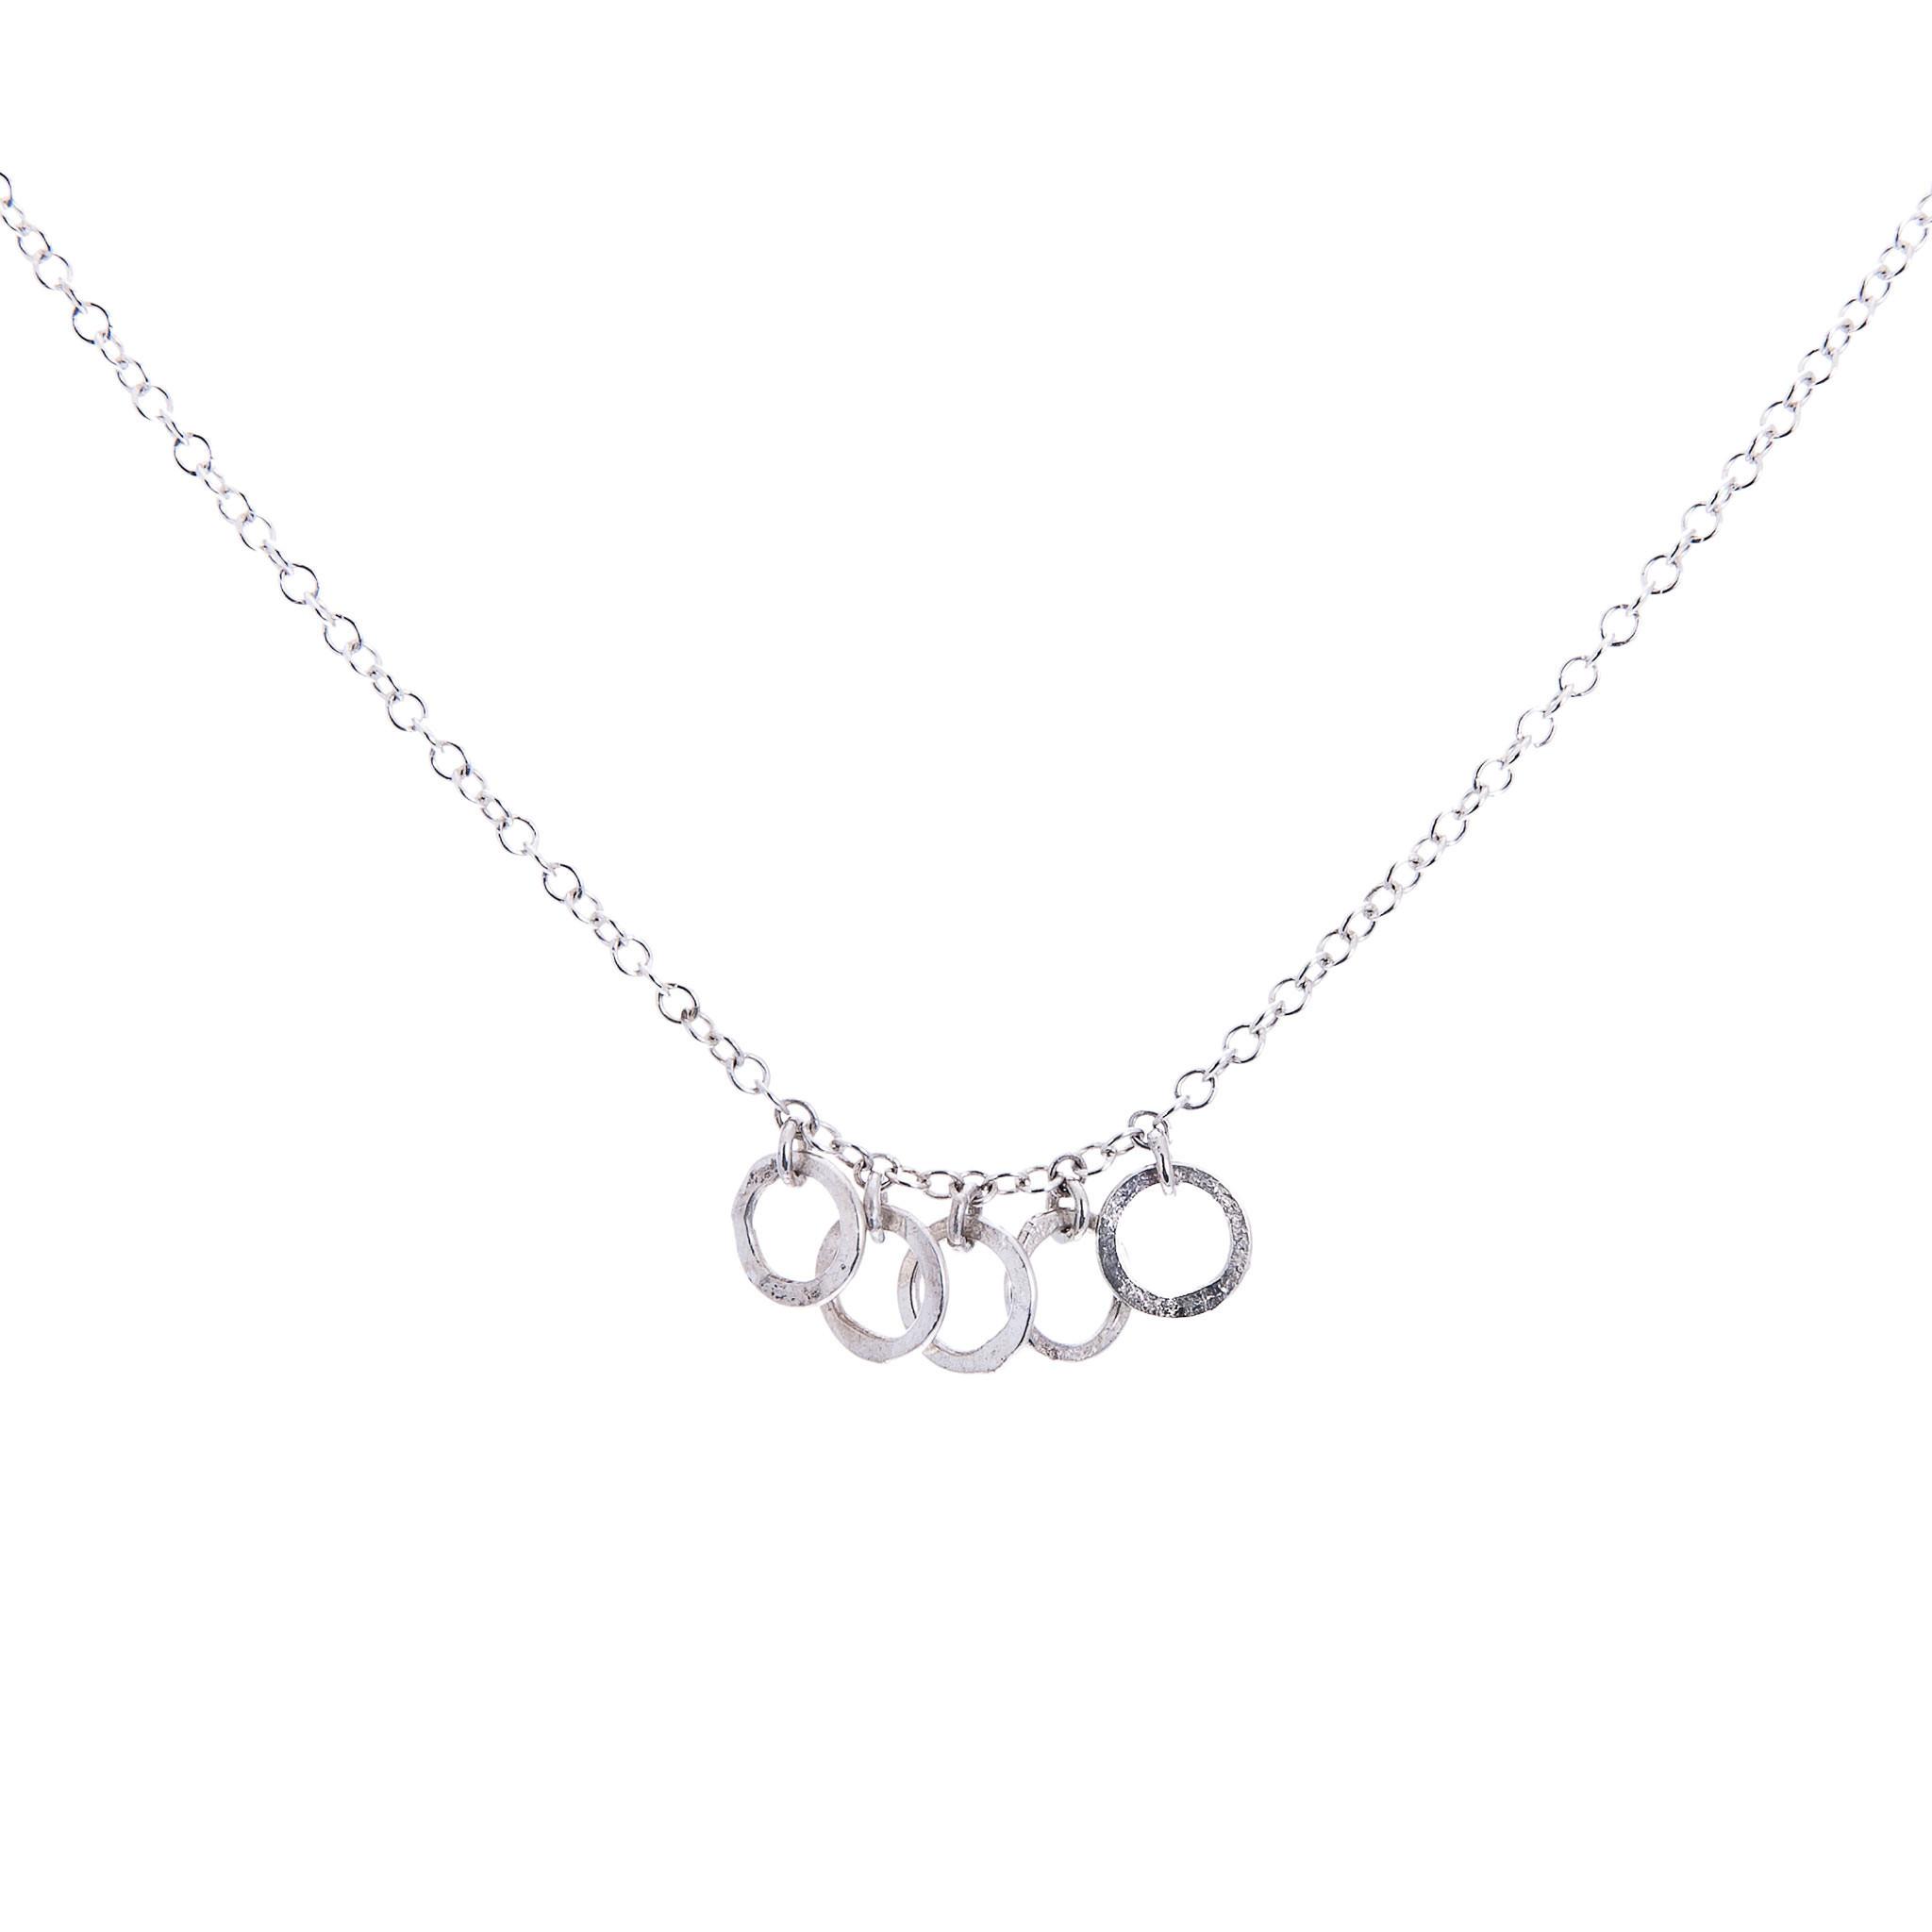 Silver Necklace|Matte Hammered Circles|Handmade Designer Jewellery 00095